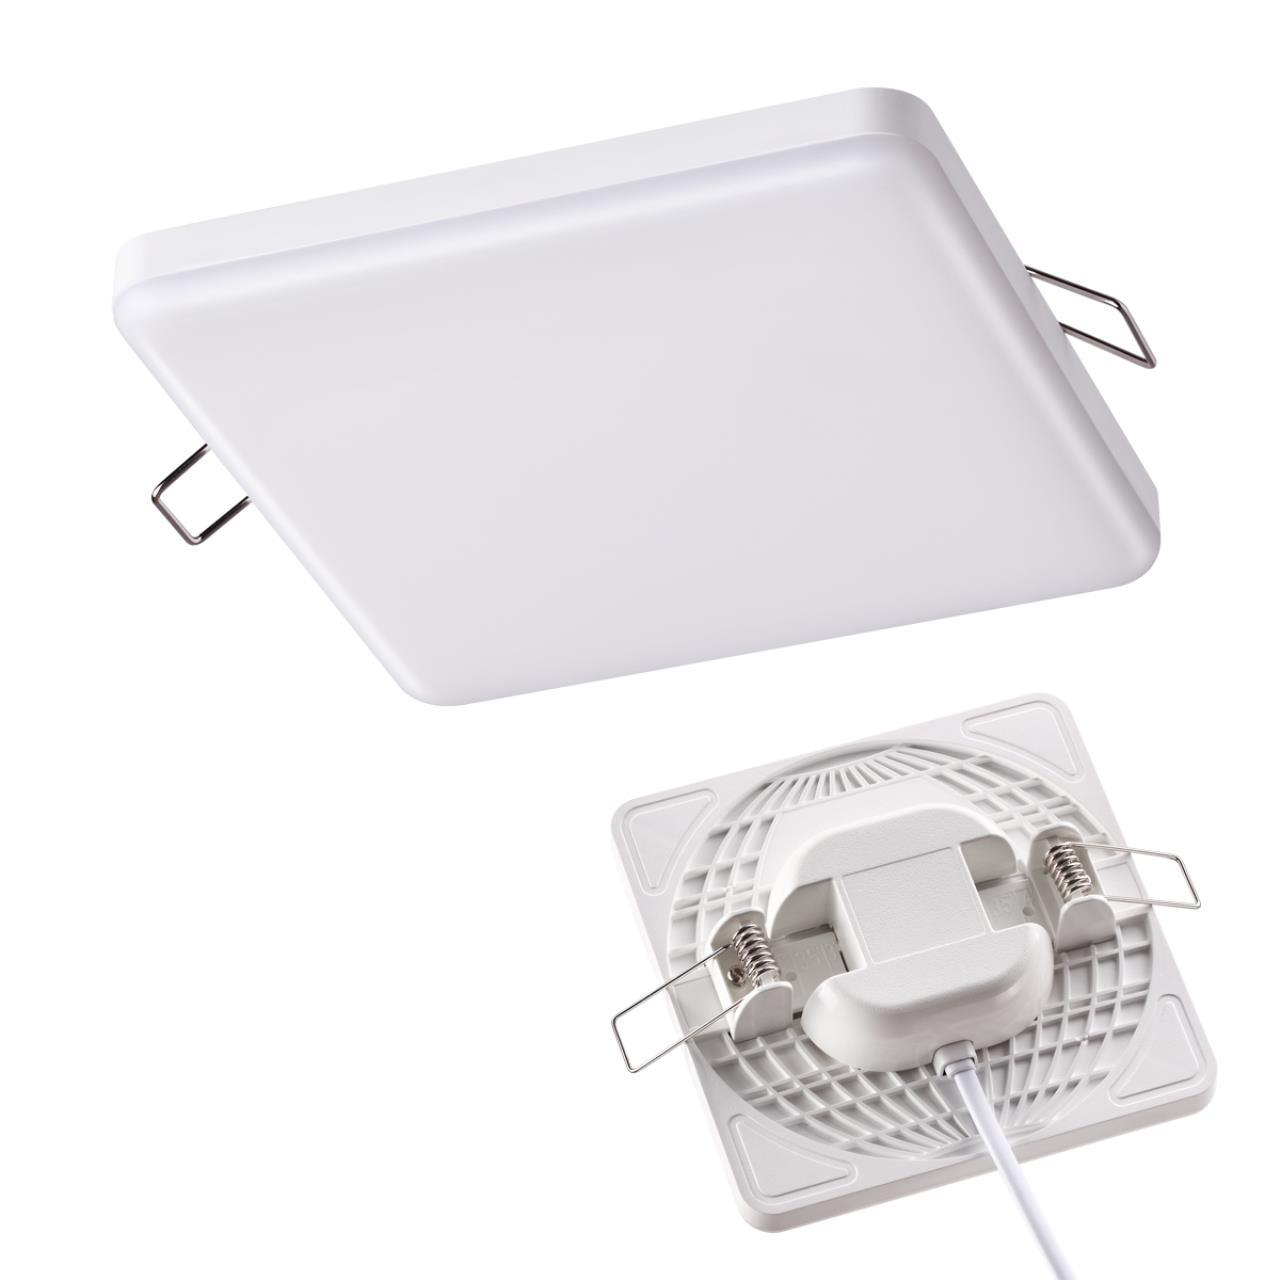 358151 SPOT NT19 078 белый Встраиваемый светильник IP20 LED 3000K 24W 85 - 265V MOON